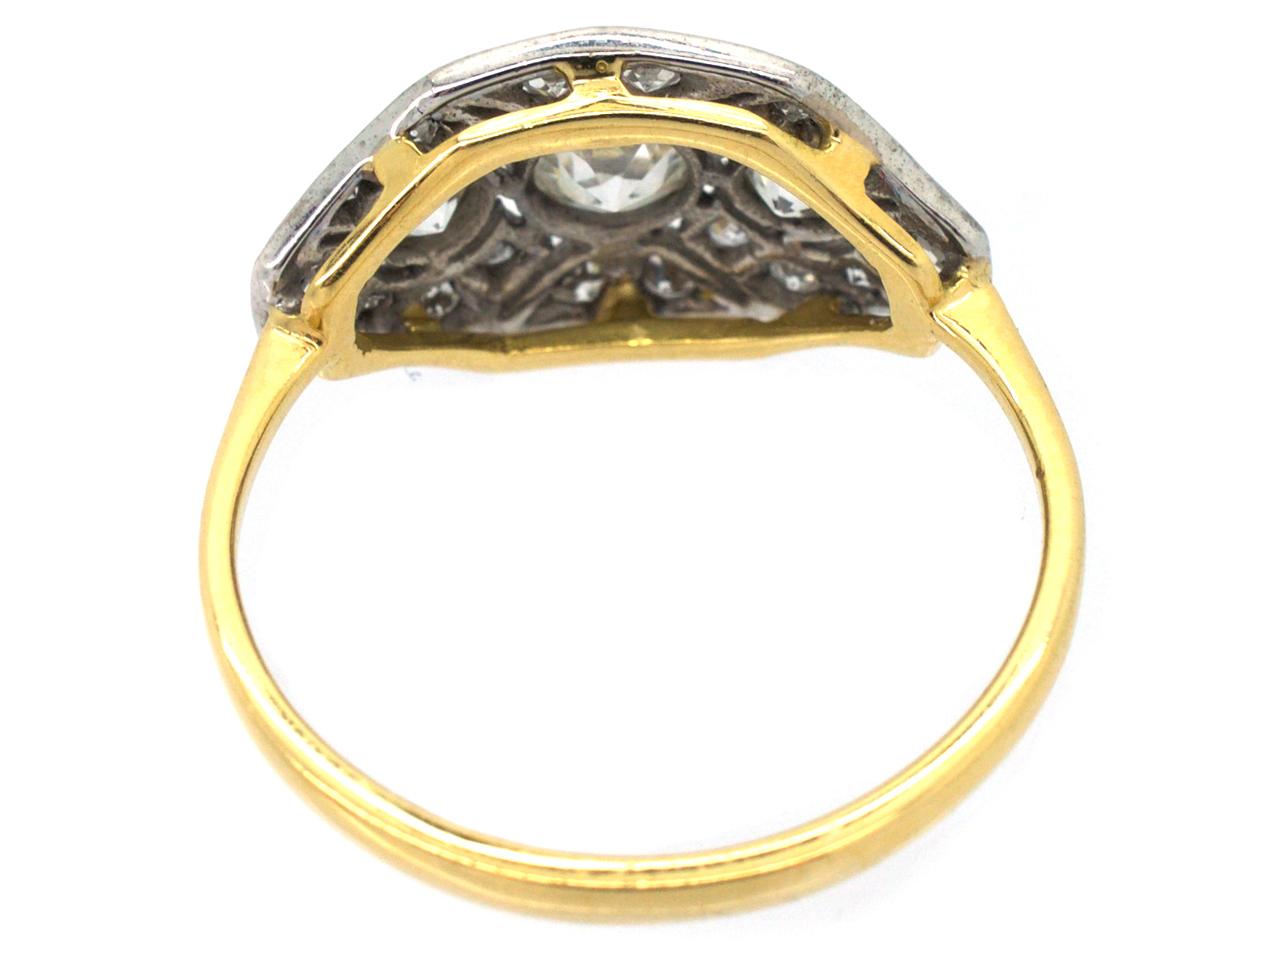 18ct white gold platinum octagonal ring the